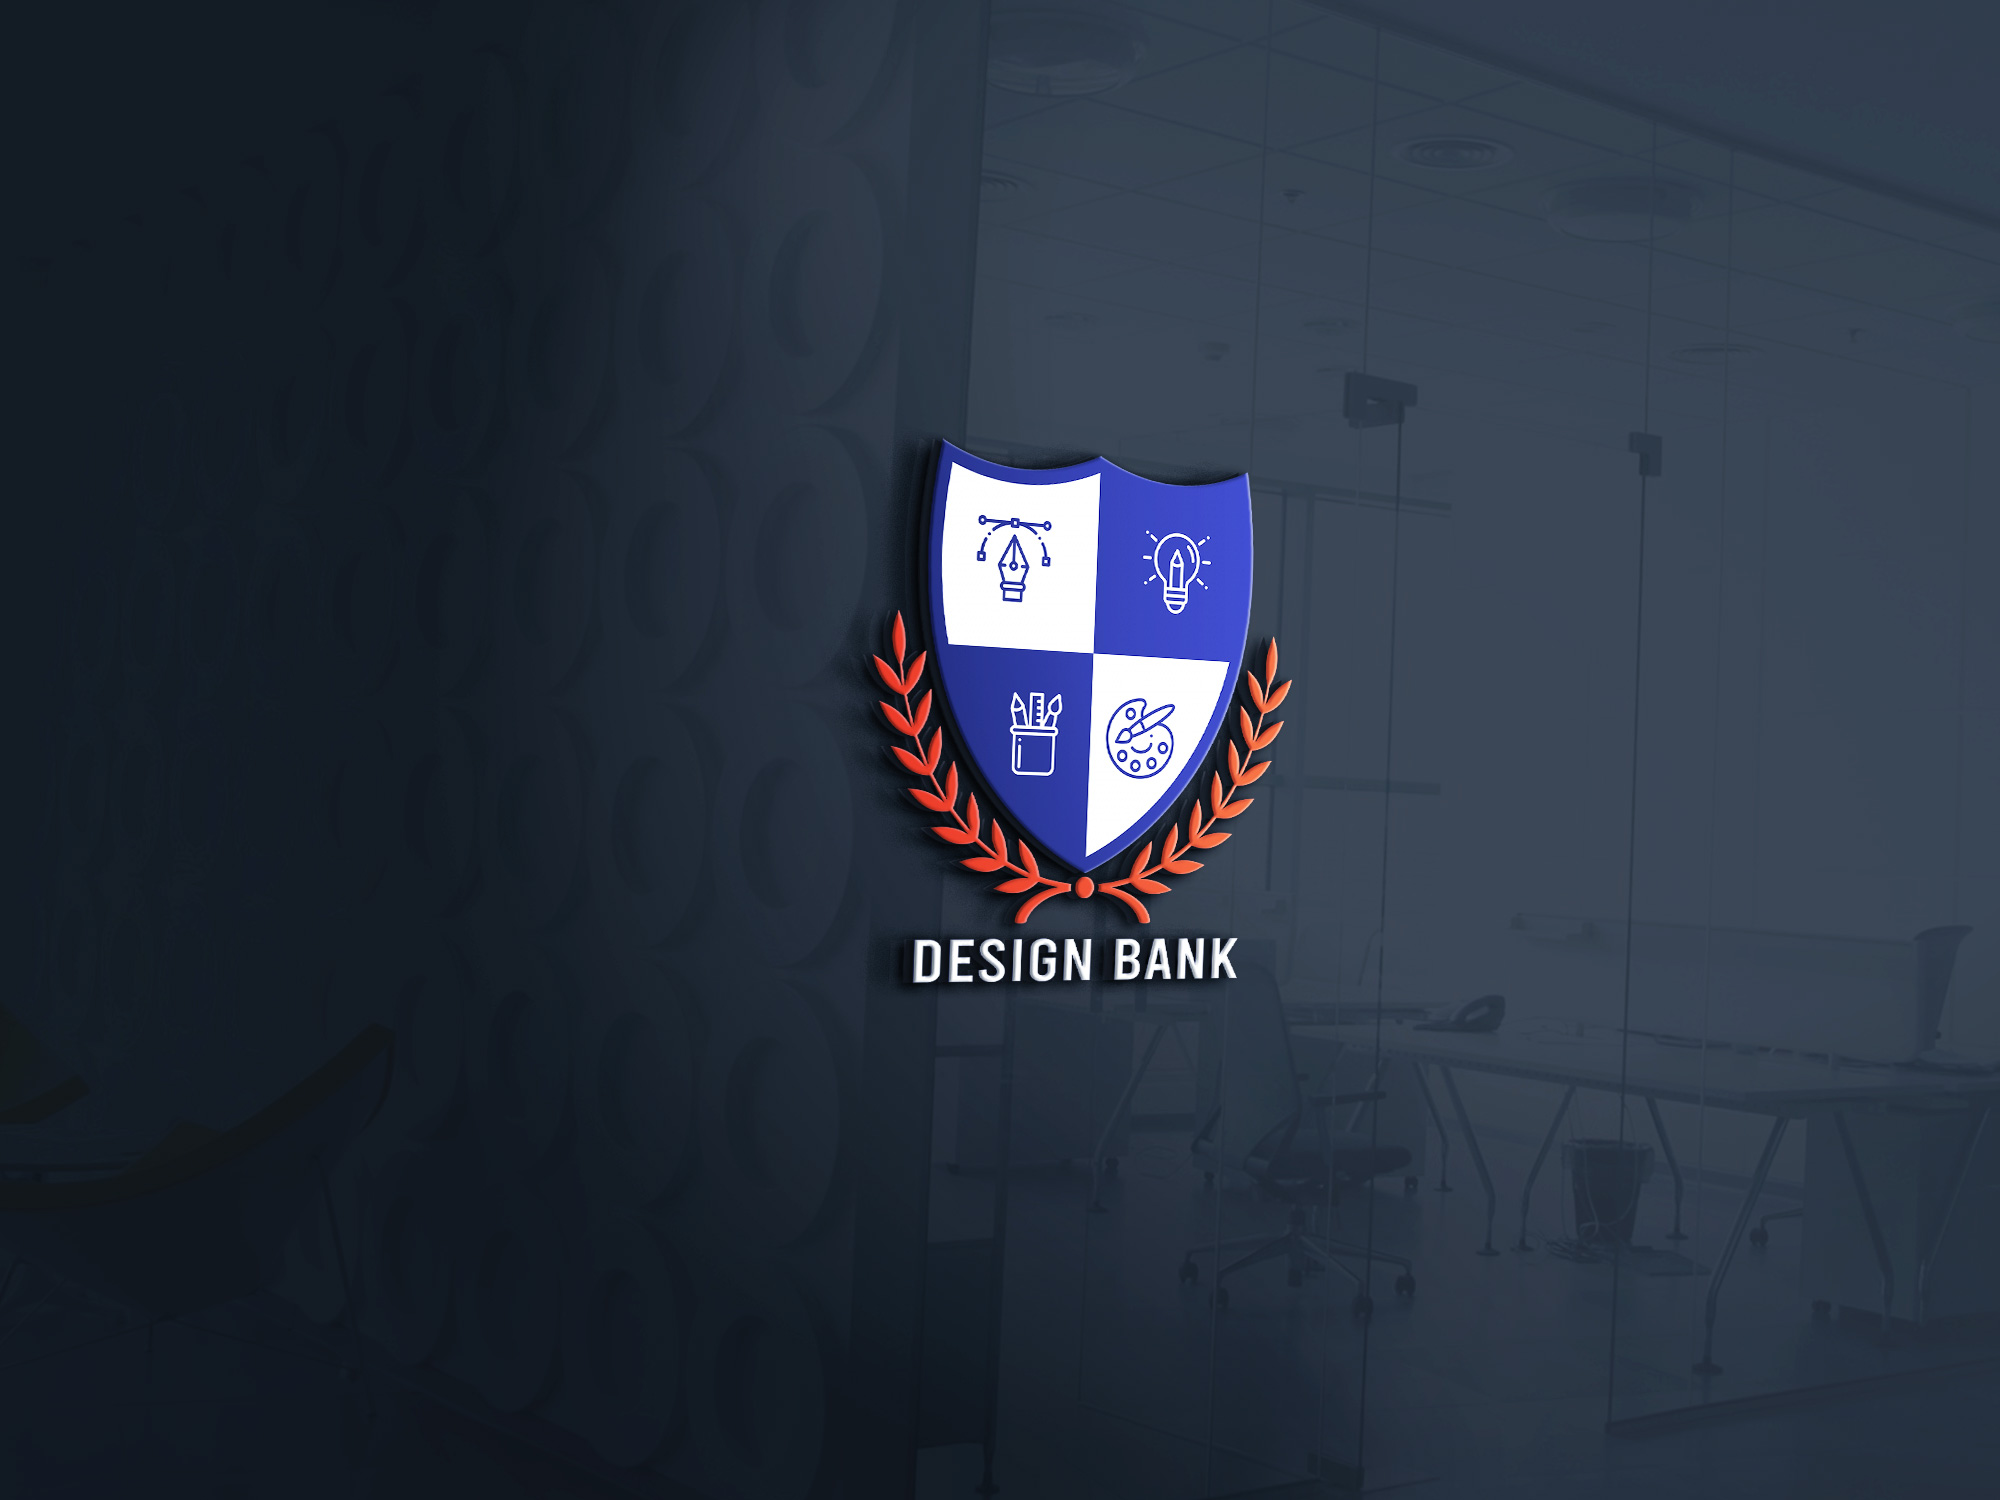 I will create minimalist and creative logo design